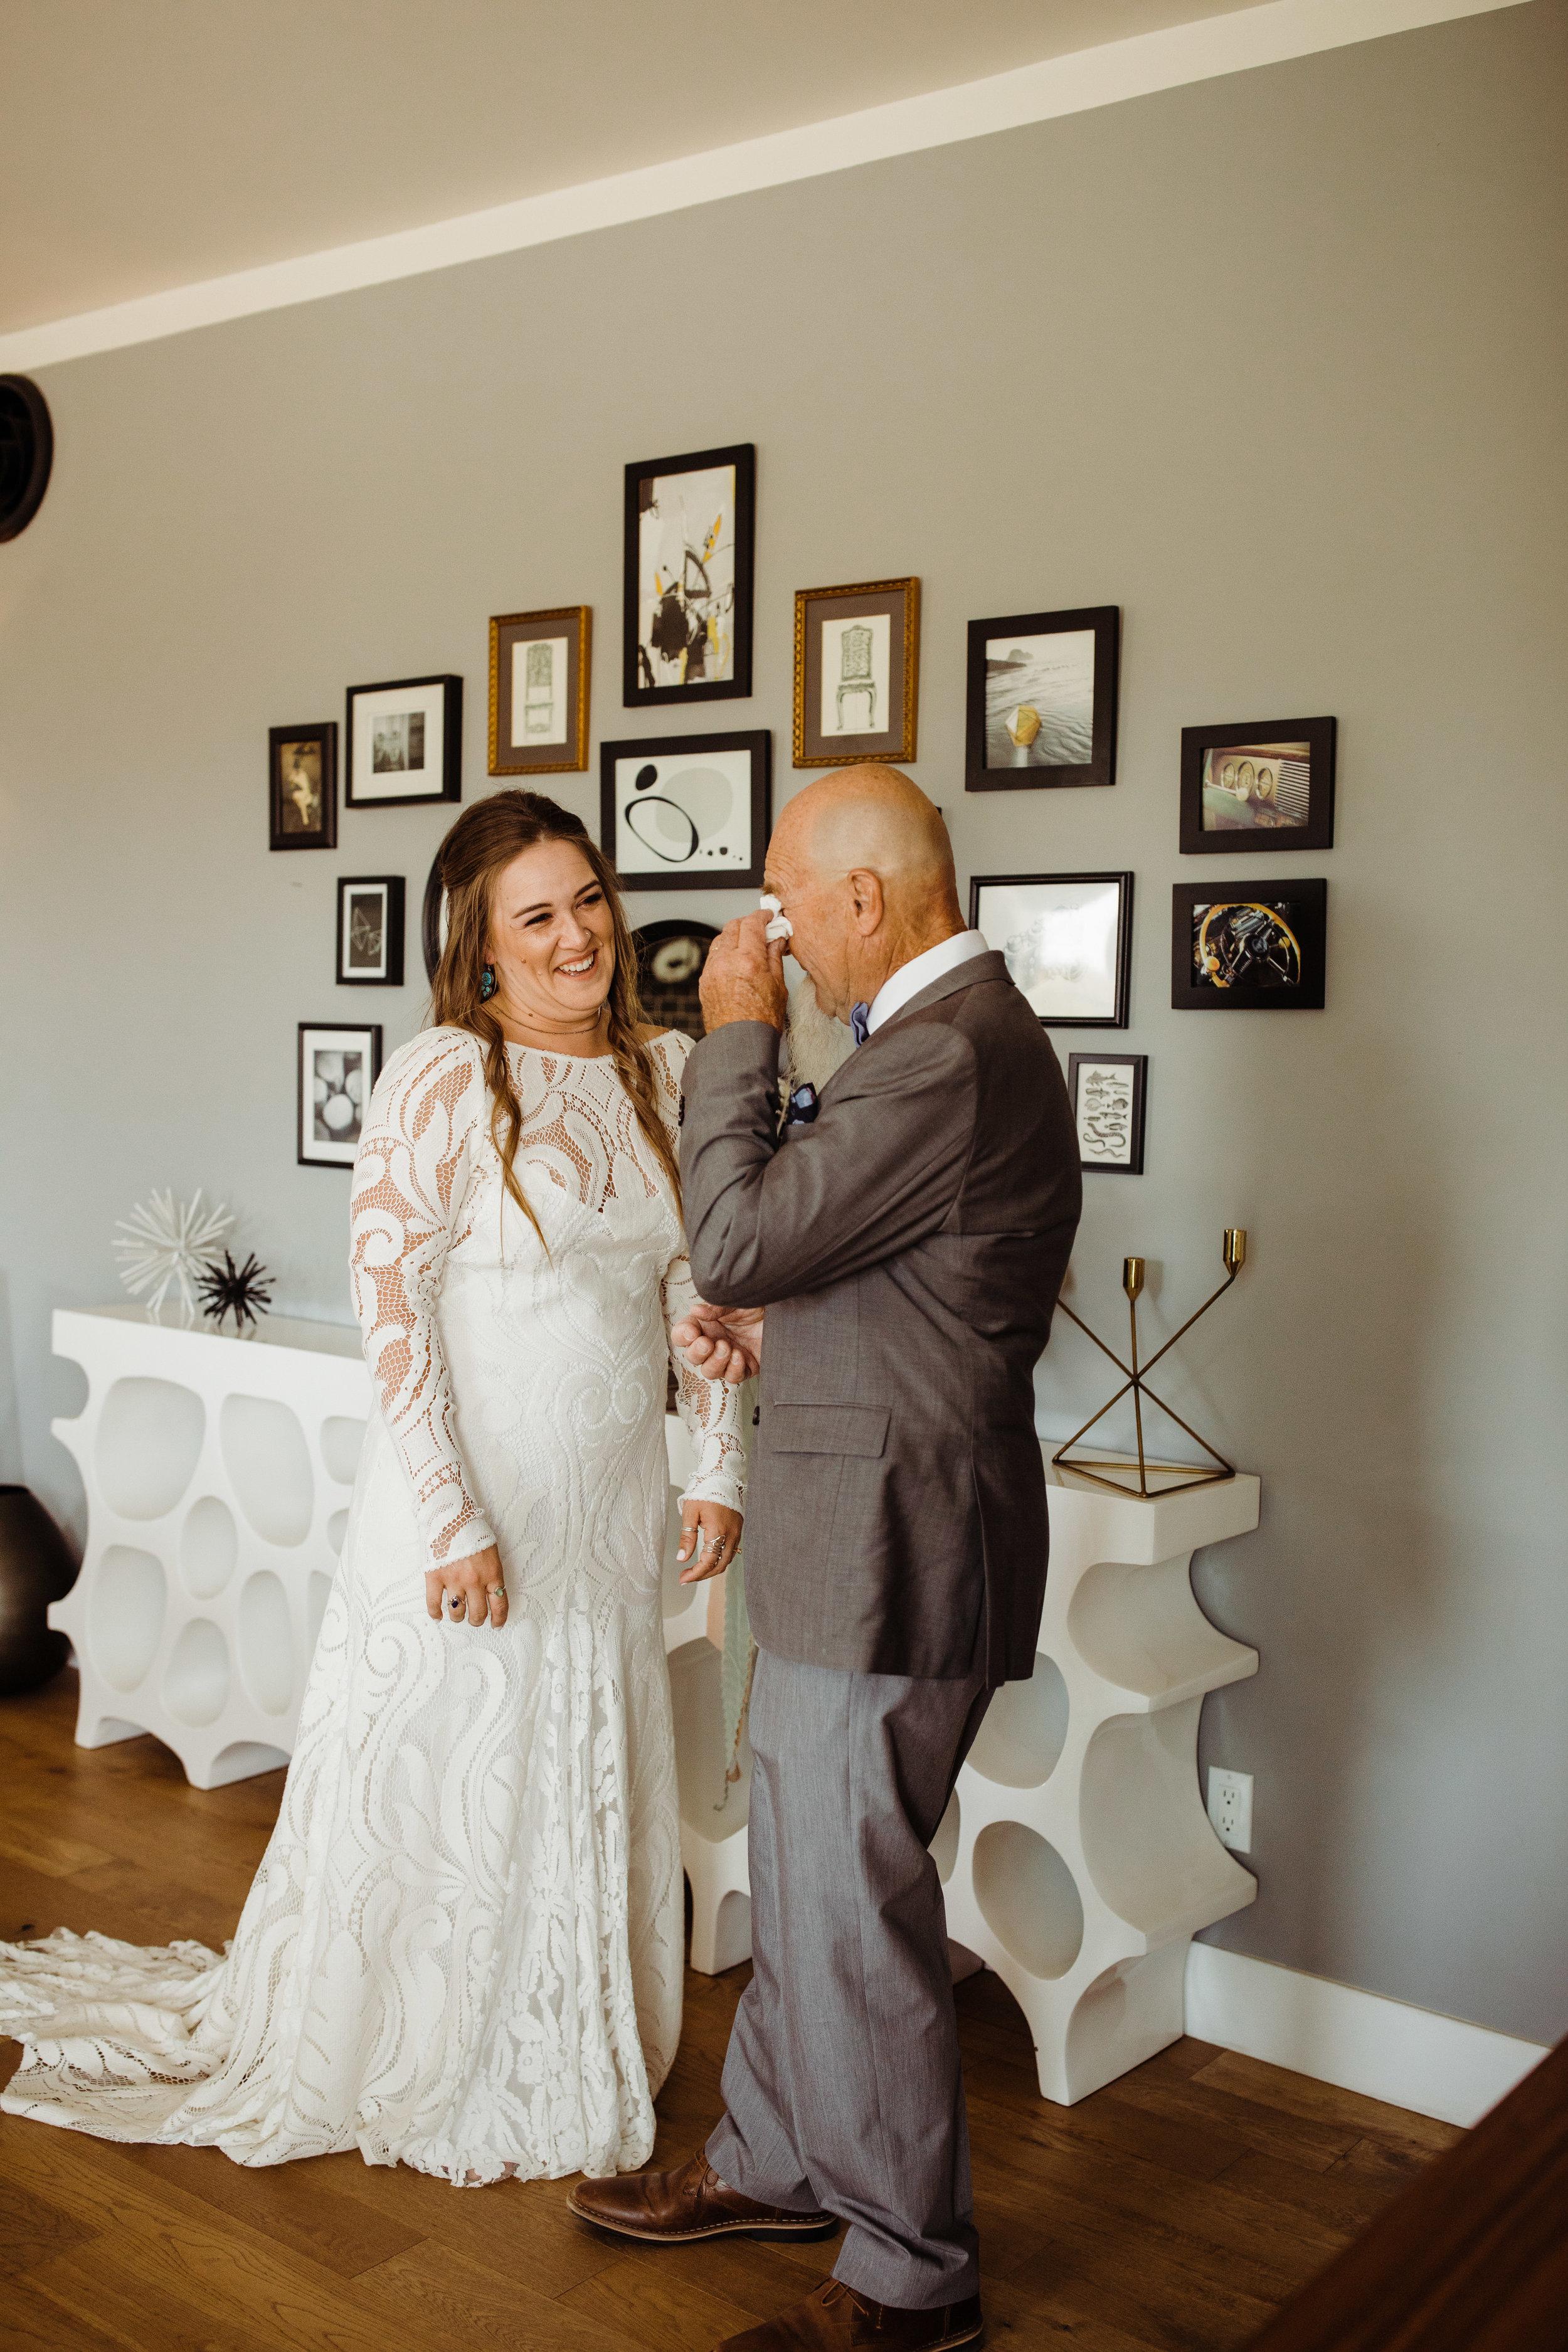 Tumbleweed-Sanctuary-Wedding-First-Look-With-Dad (5).jpg